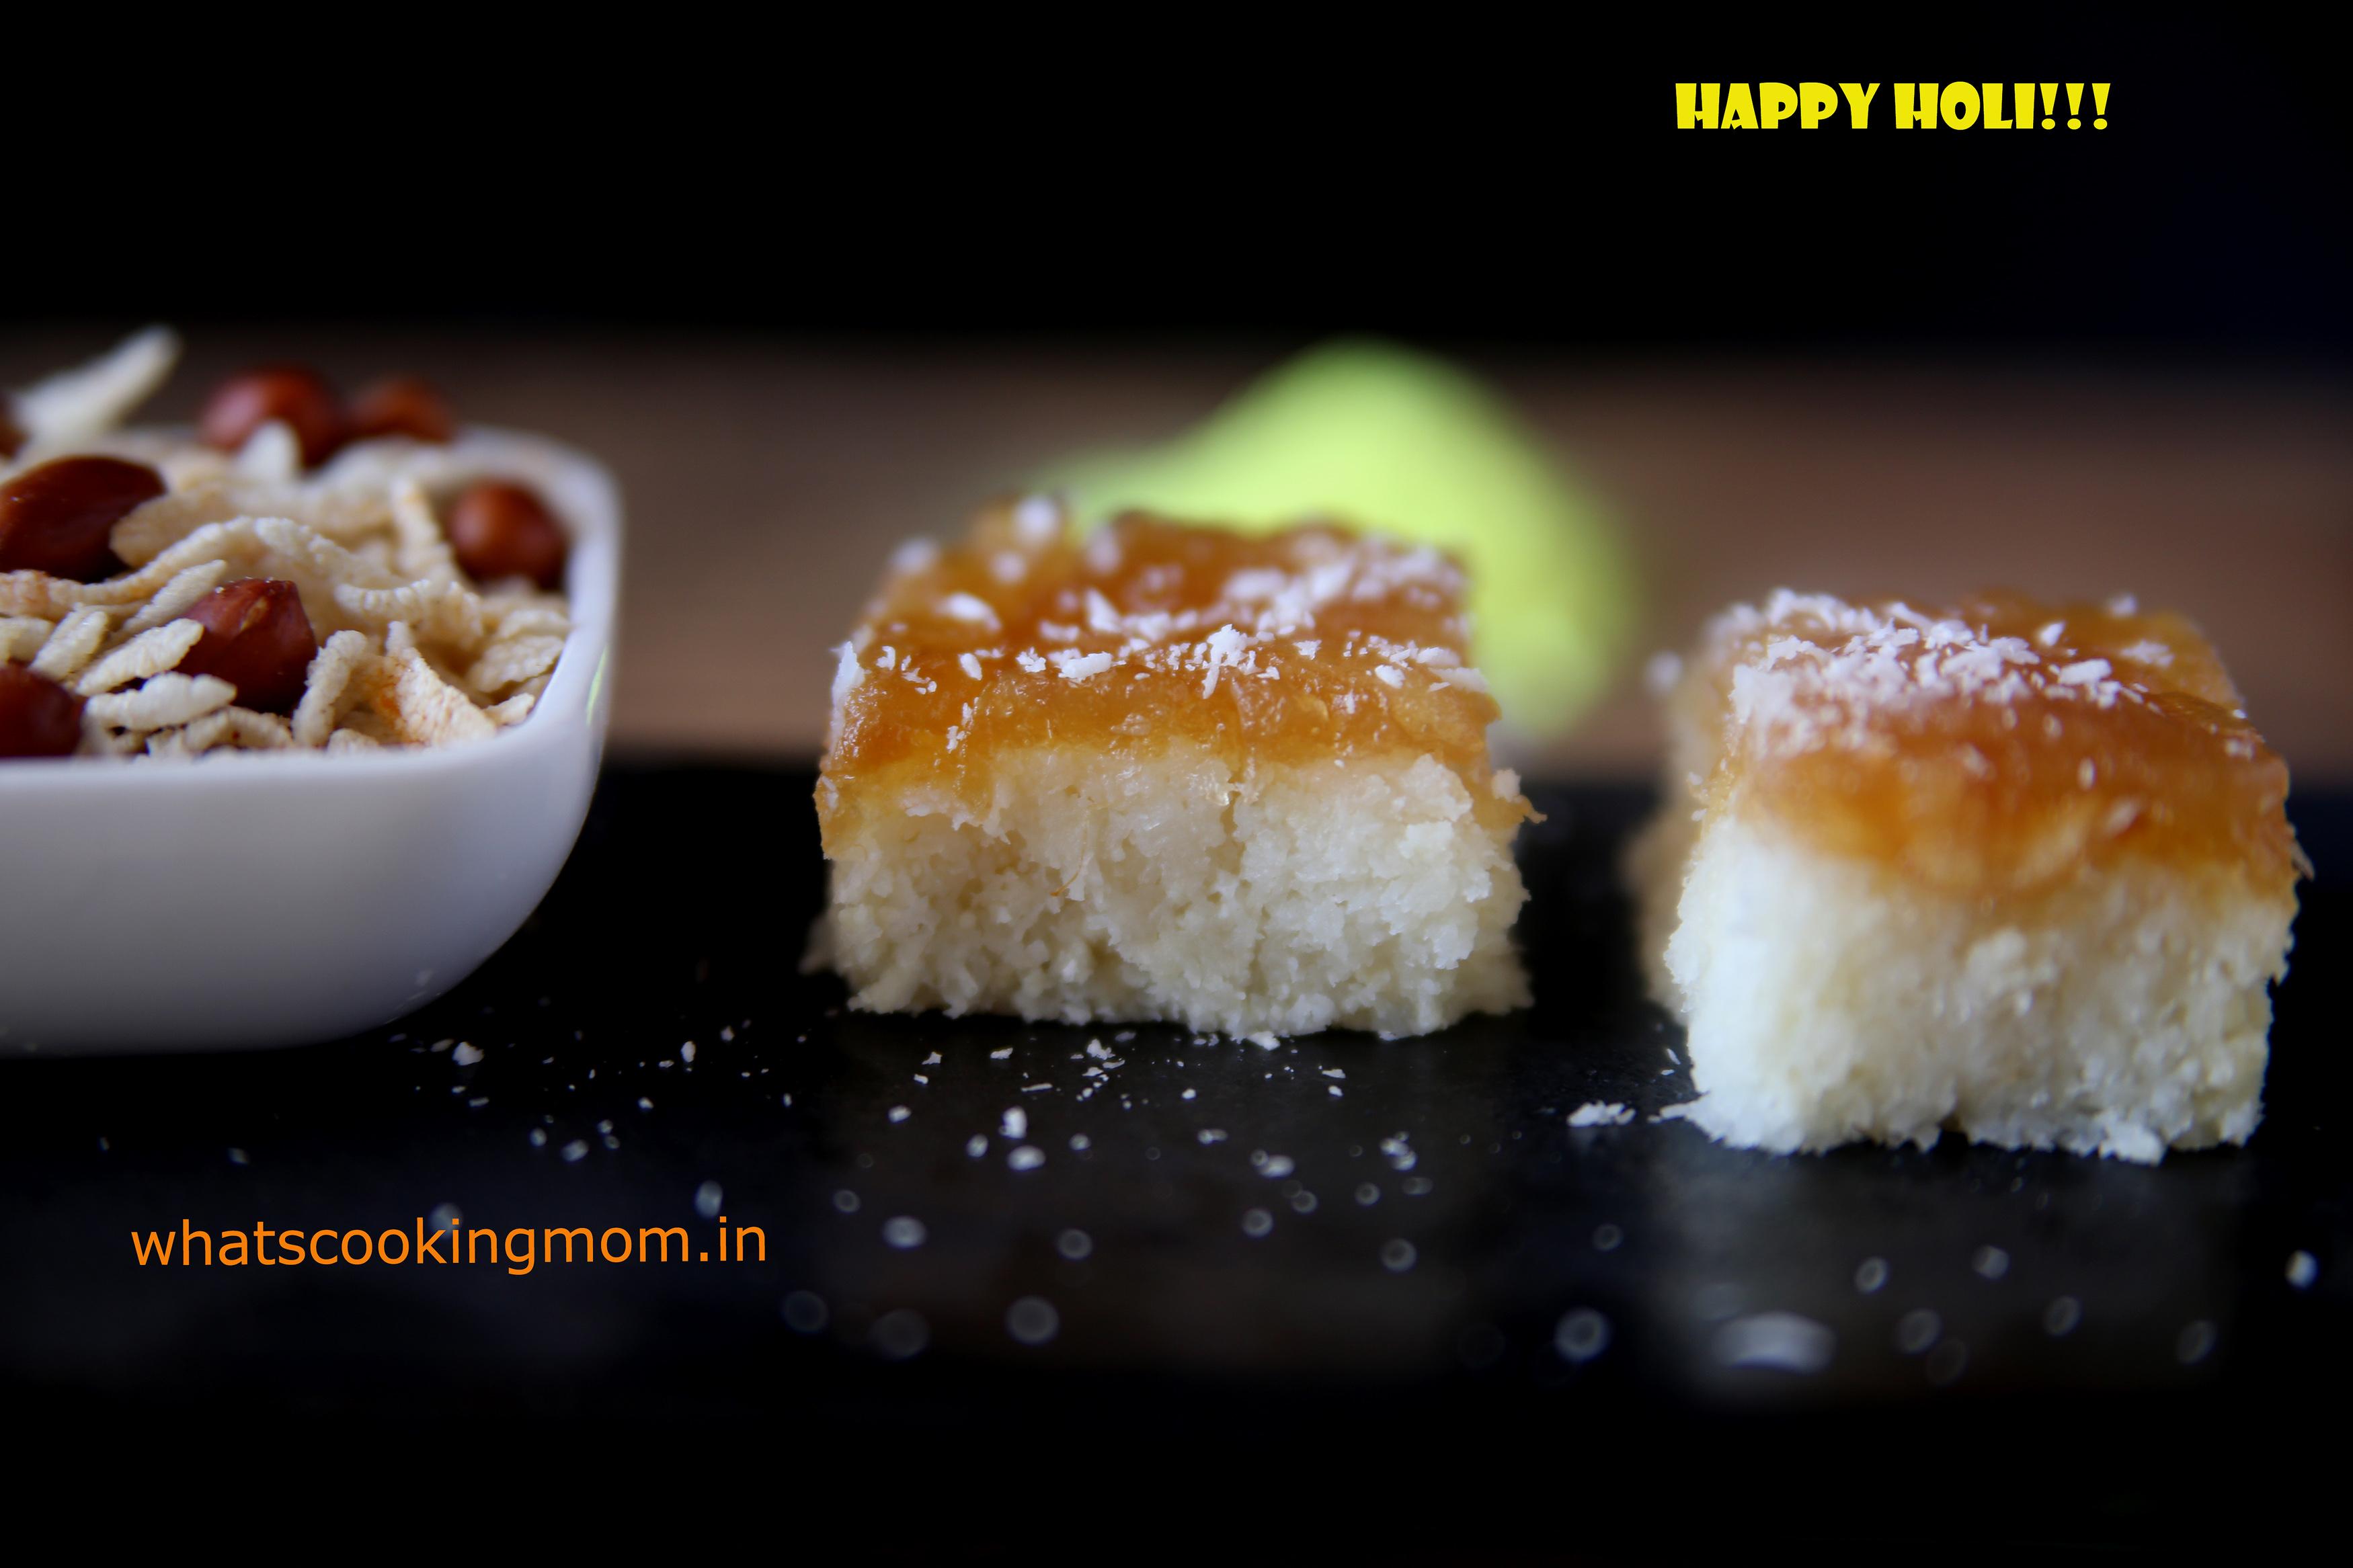 nariyal burfi with apple pie filling 4